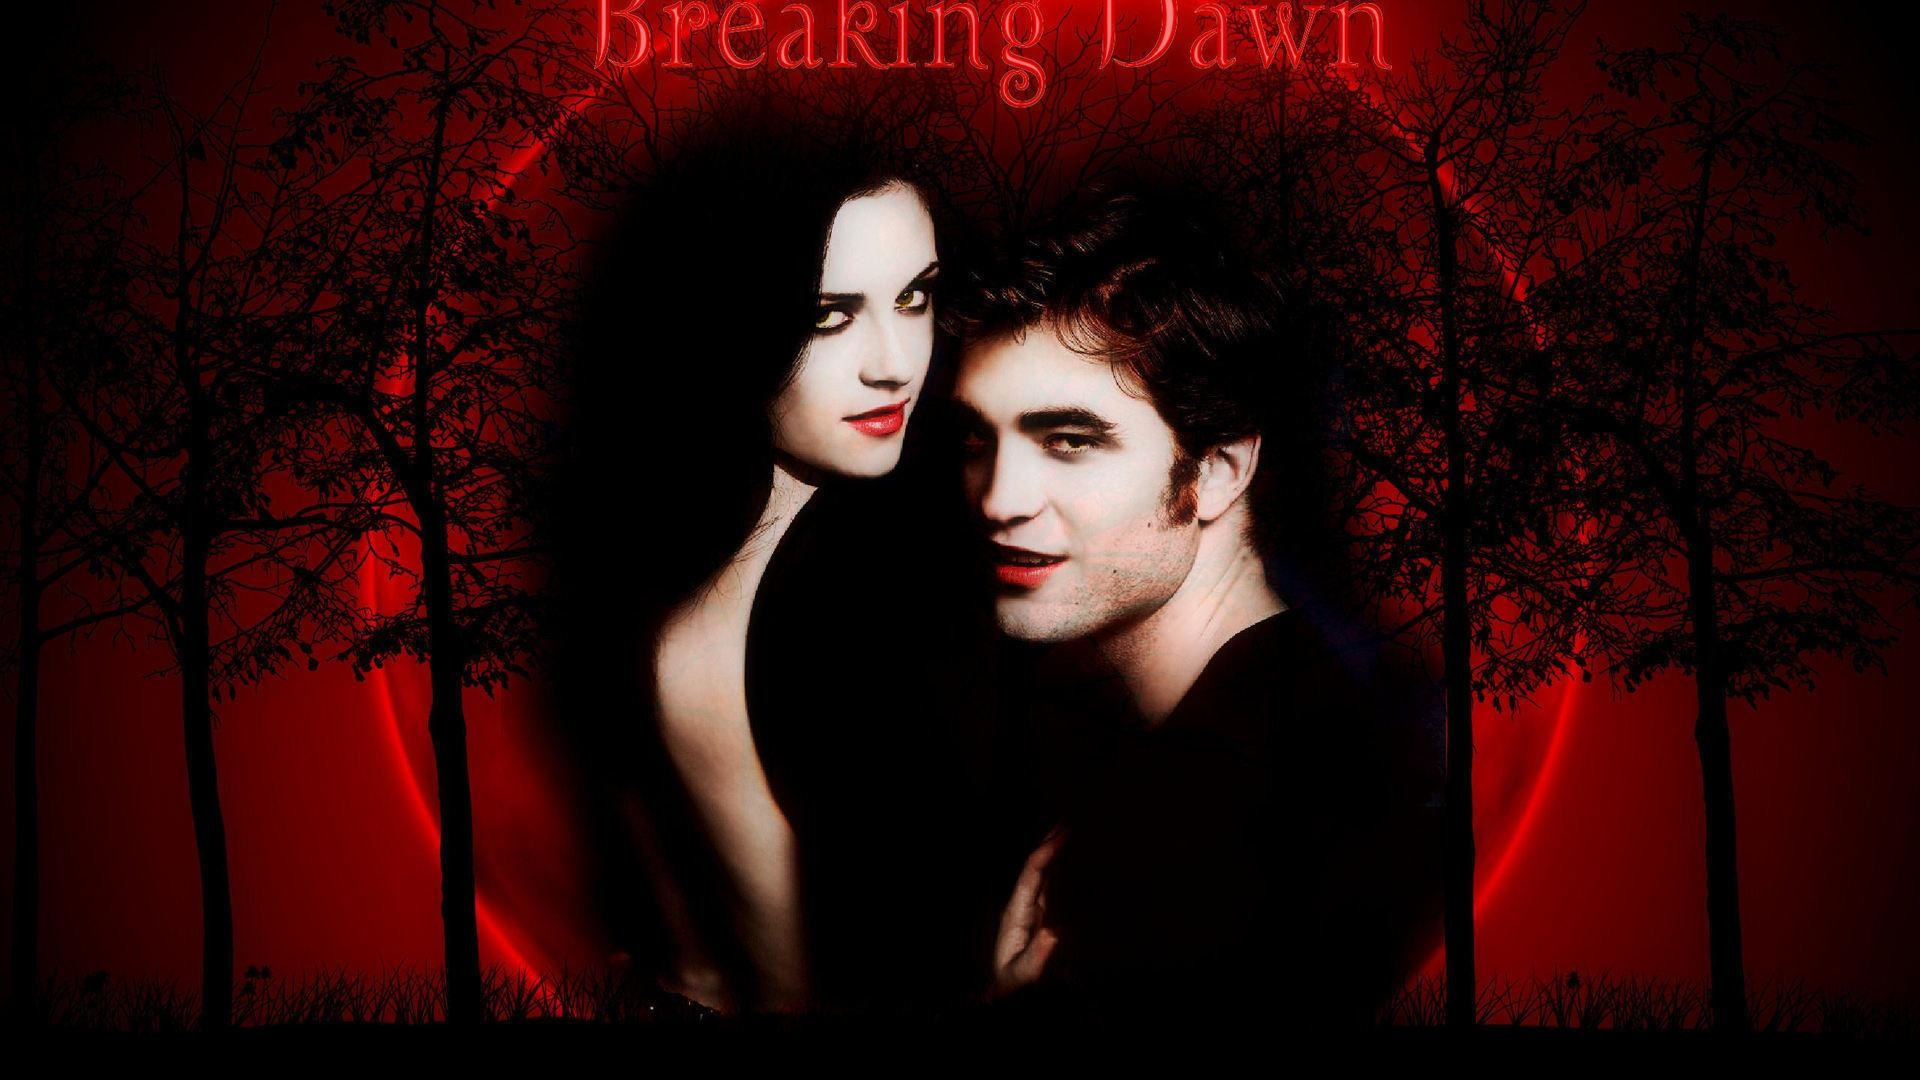 Twilight saga backgrounds - Twilight breaking dawn wallpaper ...